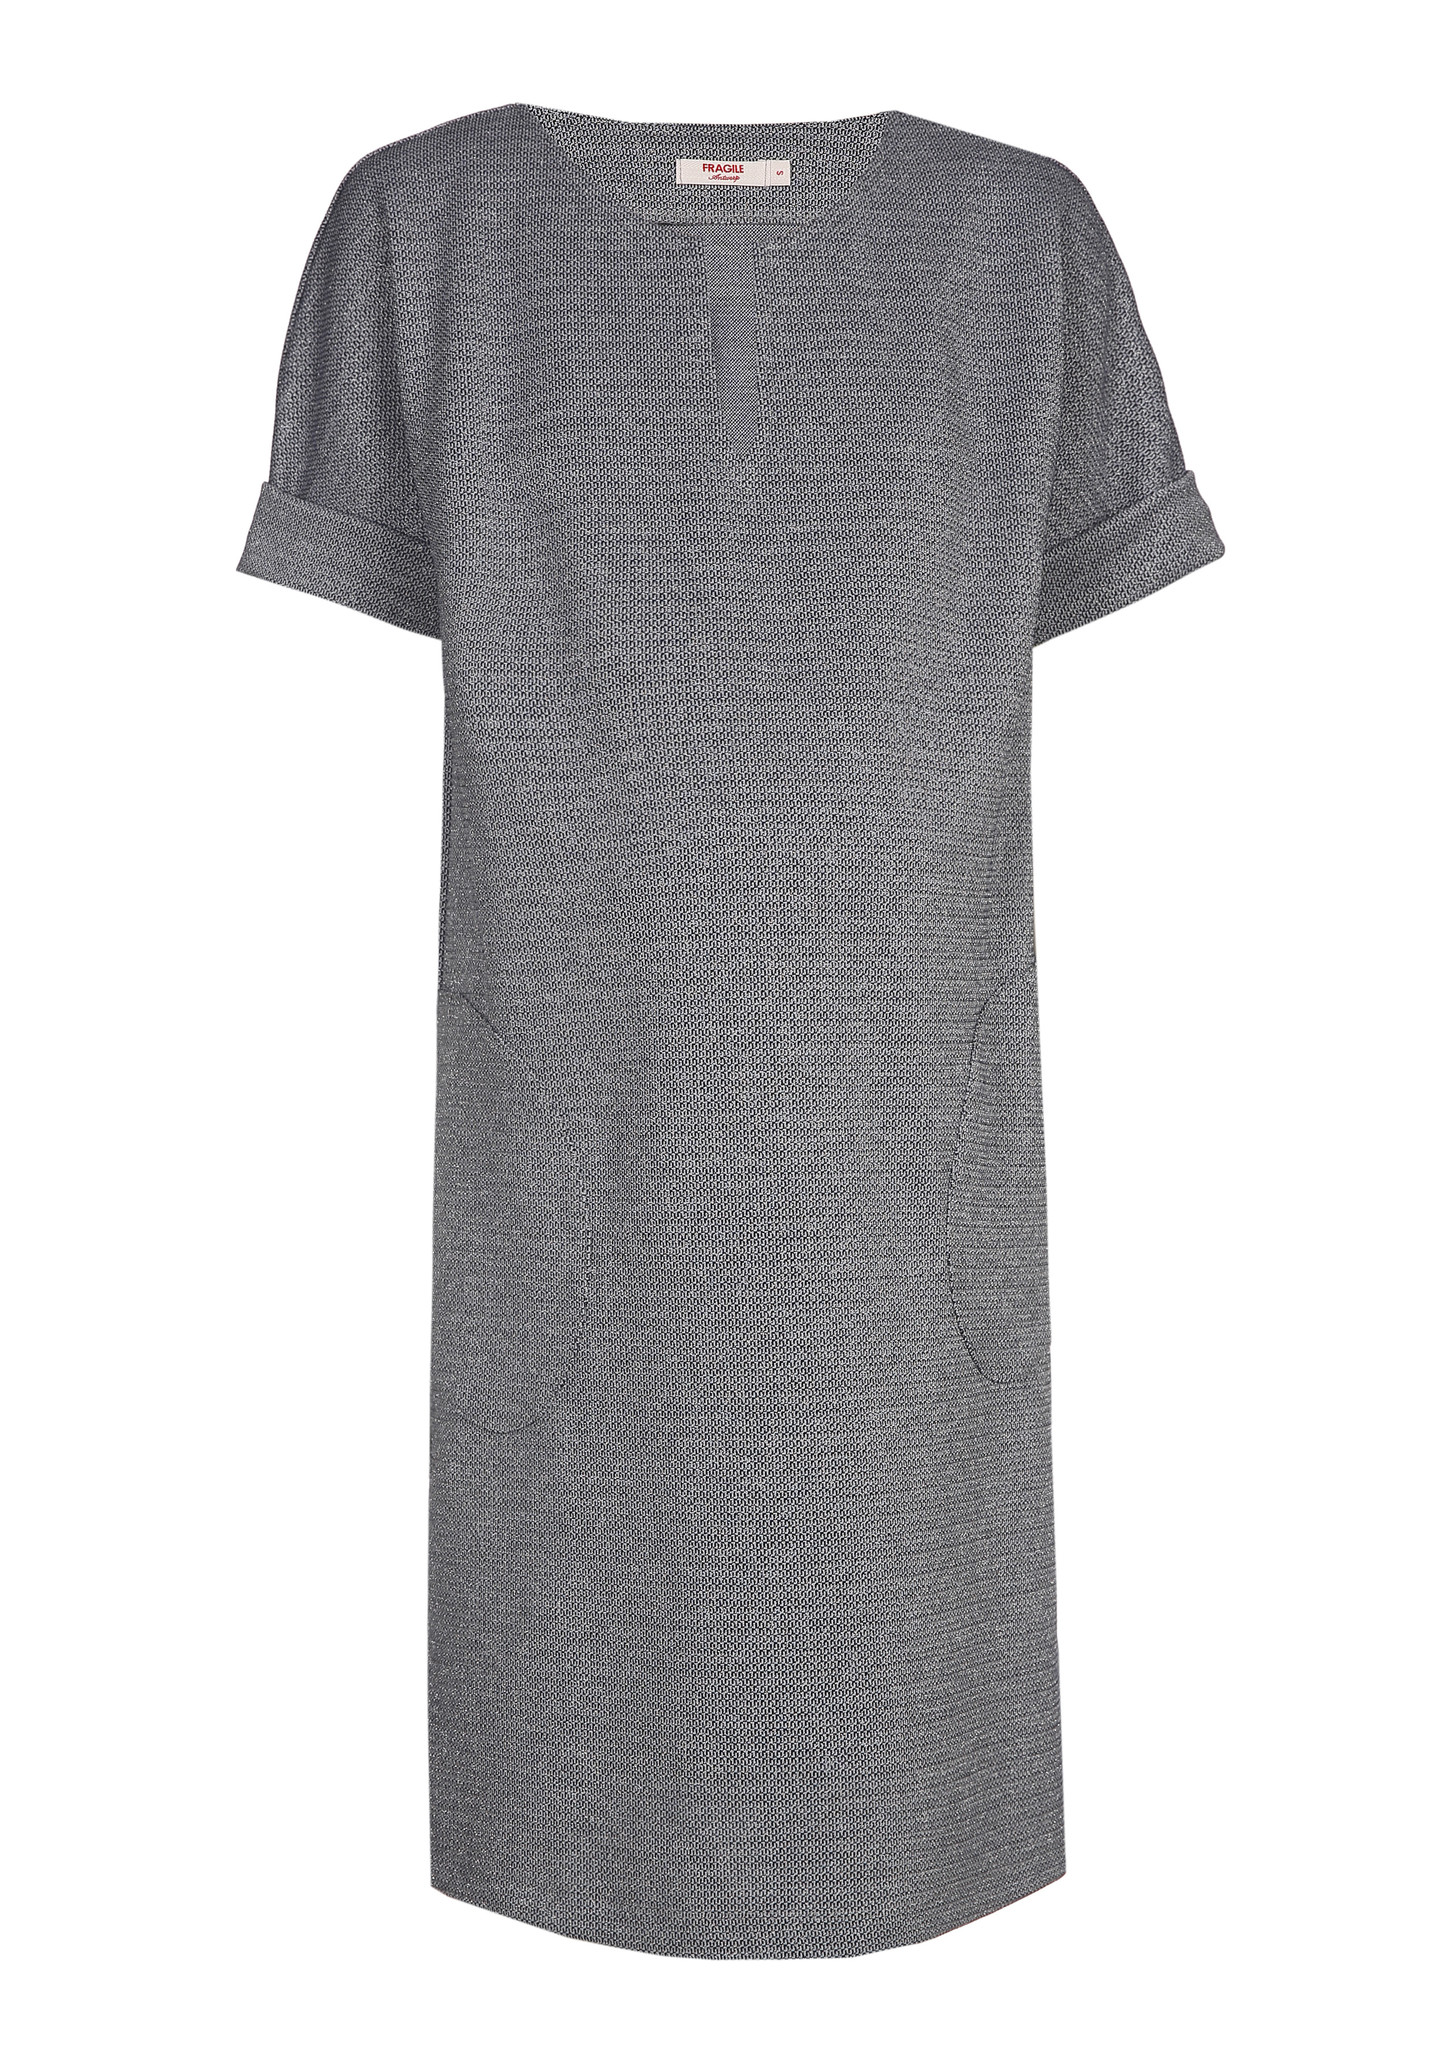 Round Pocket Dress Jeans Sparkle-1